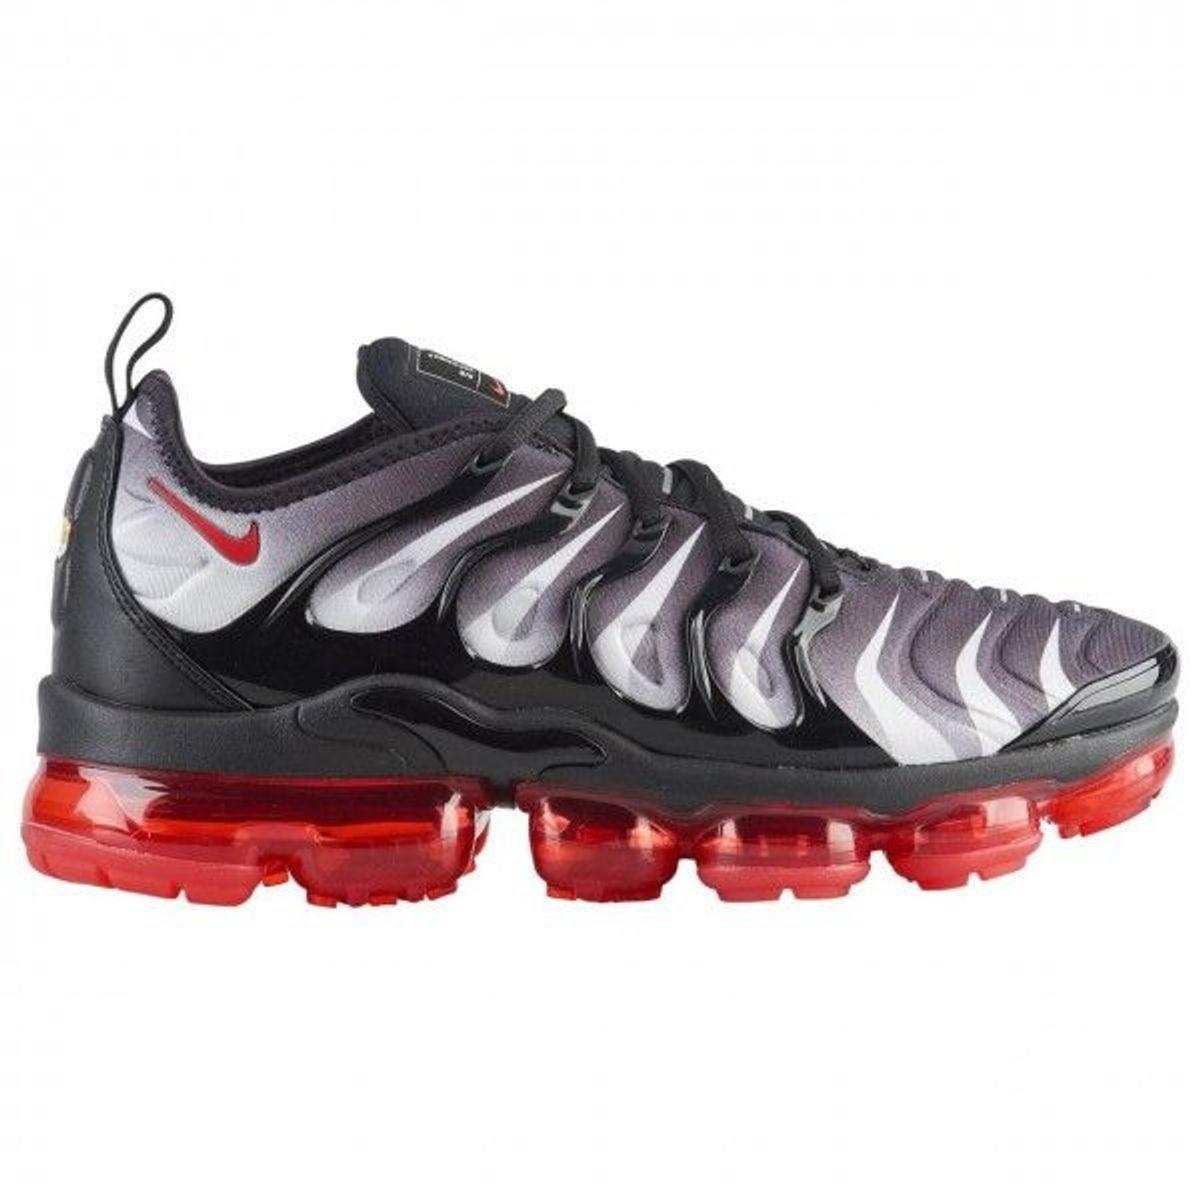 de580d7956e13 Tenis Vapormax Nike Plus Preto/vermelho Numero 42 | Tênis Masculino Nike  Nunca Usado 32273172 | enjoei